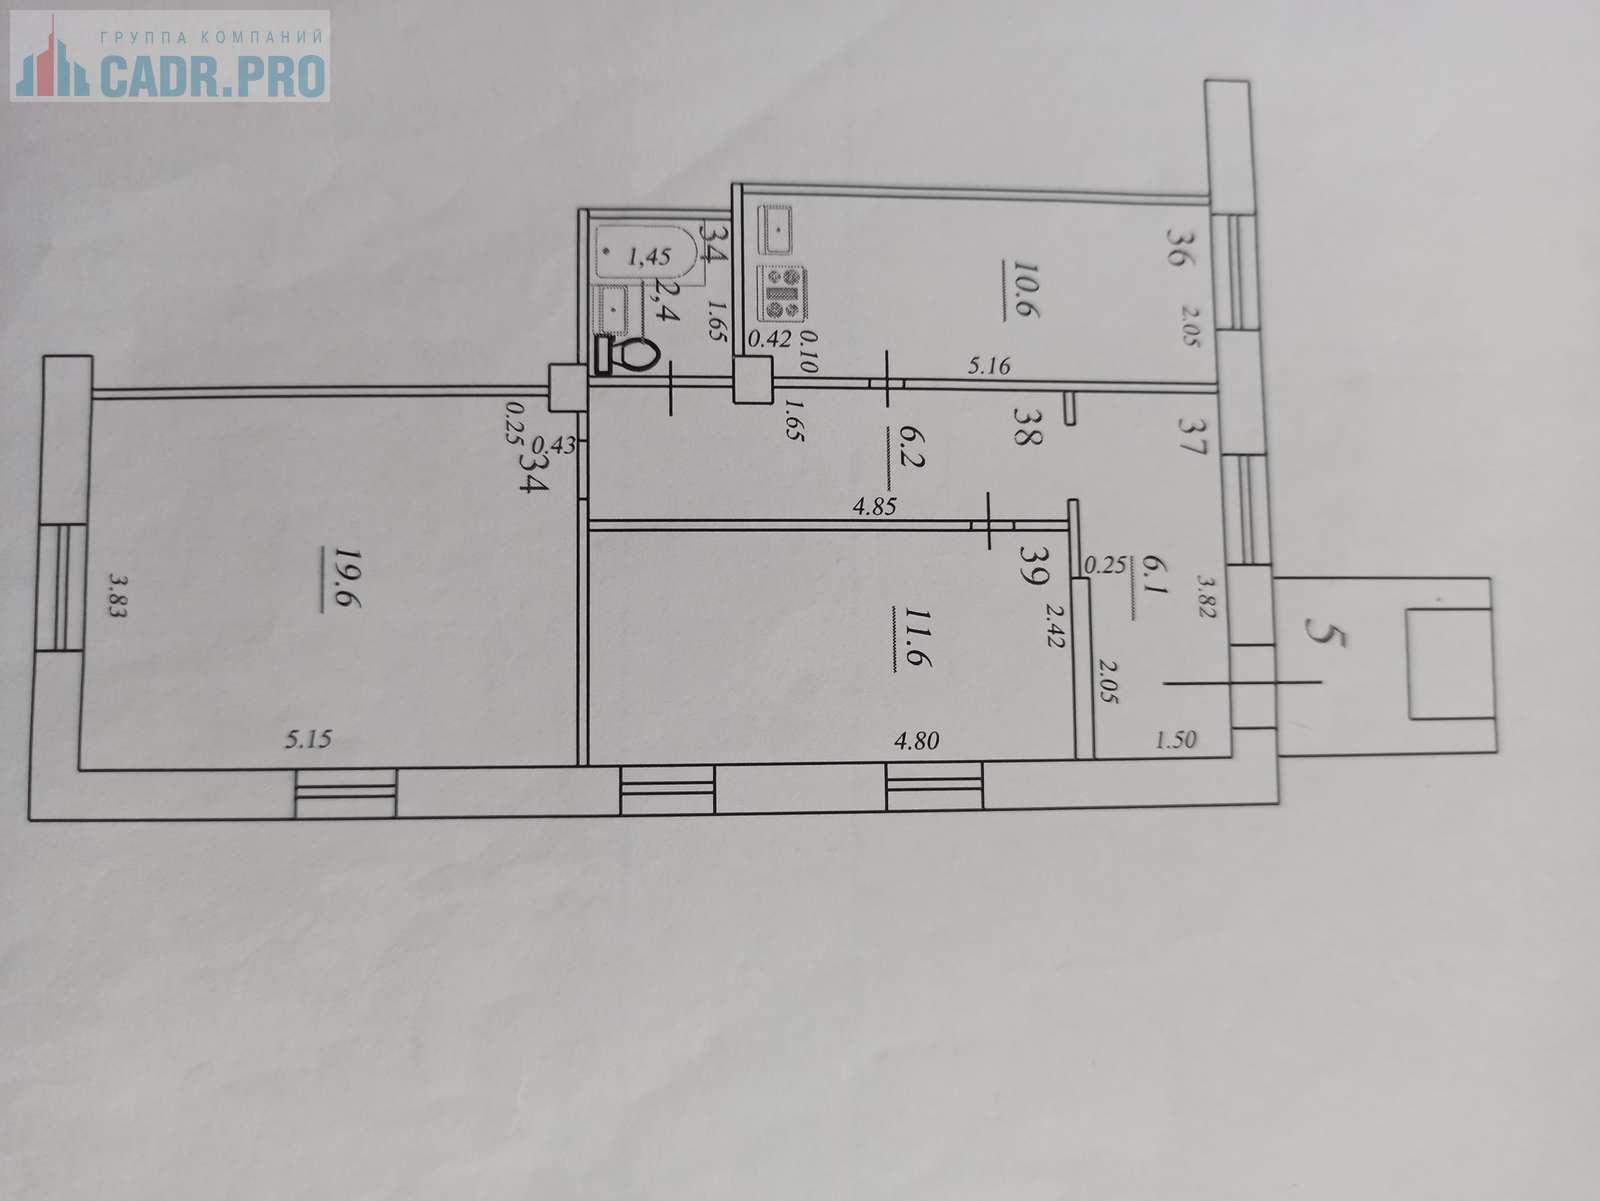 Продажа 2-комнатной квартиры, Самара, Авроры улица,  дом 3